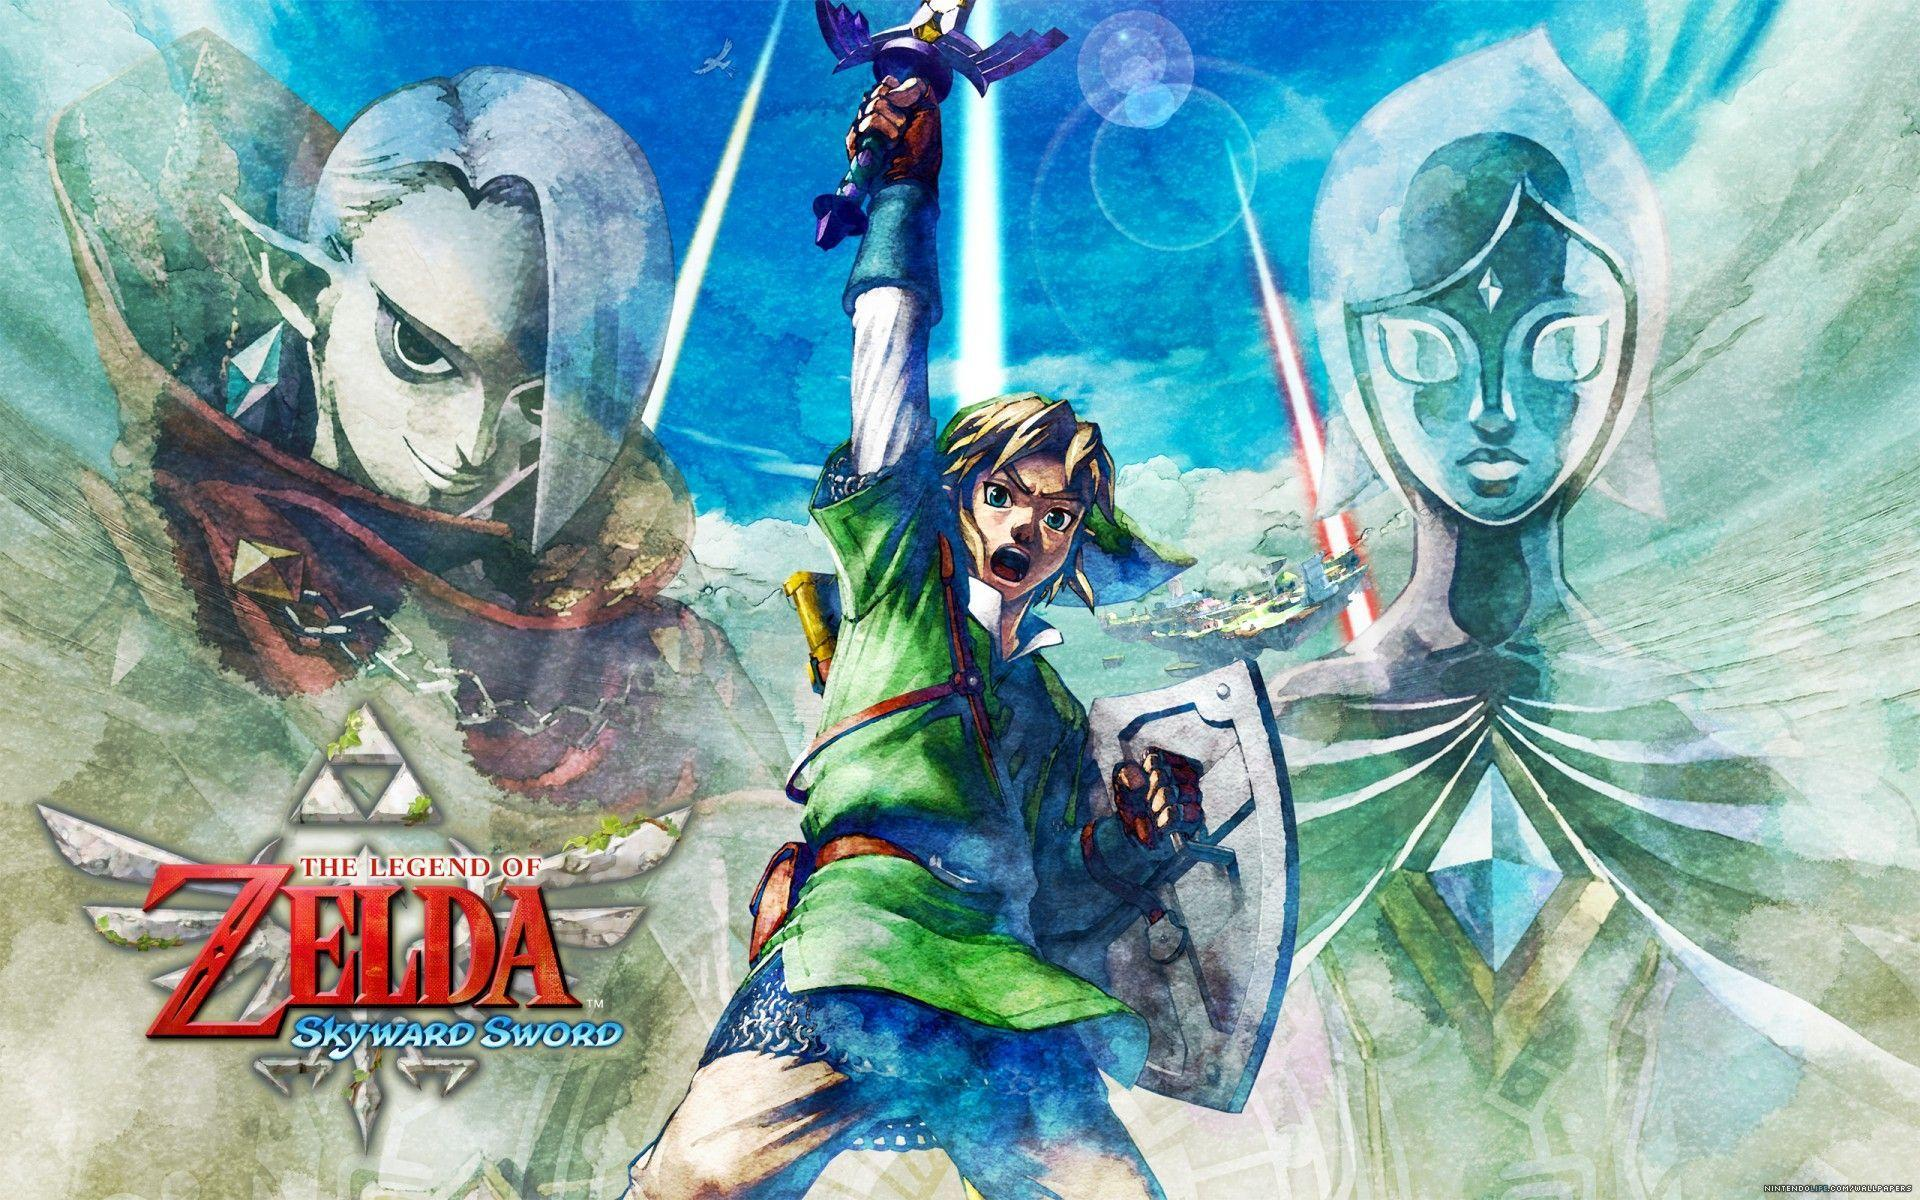 Zelda Twilight Princess Wallpapers Hd Wallpaper Cave